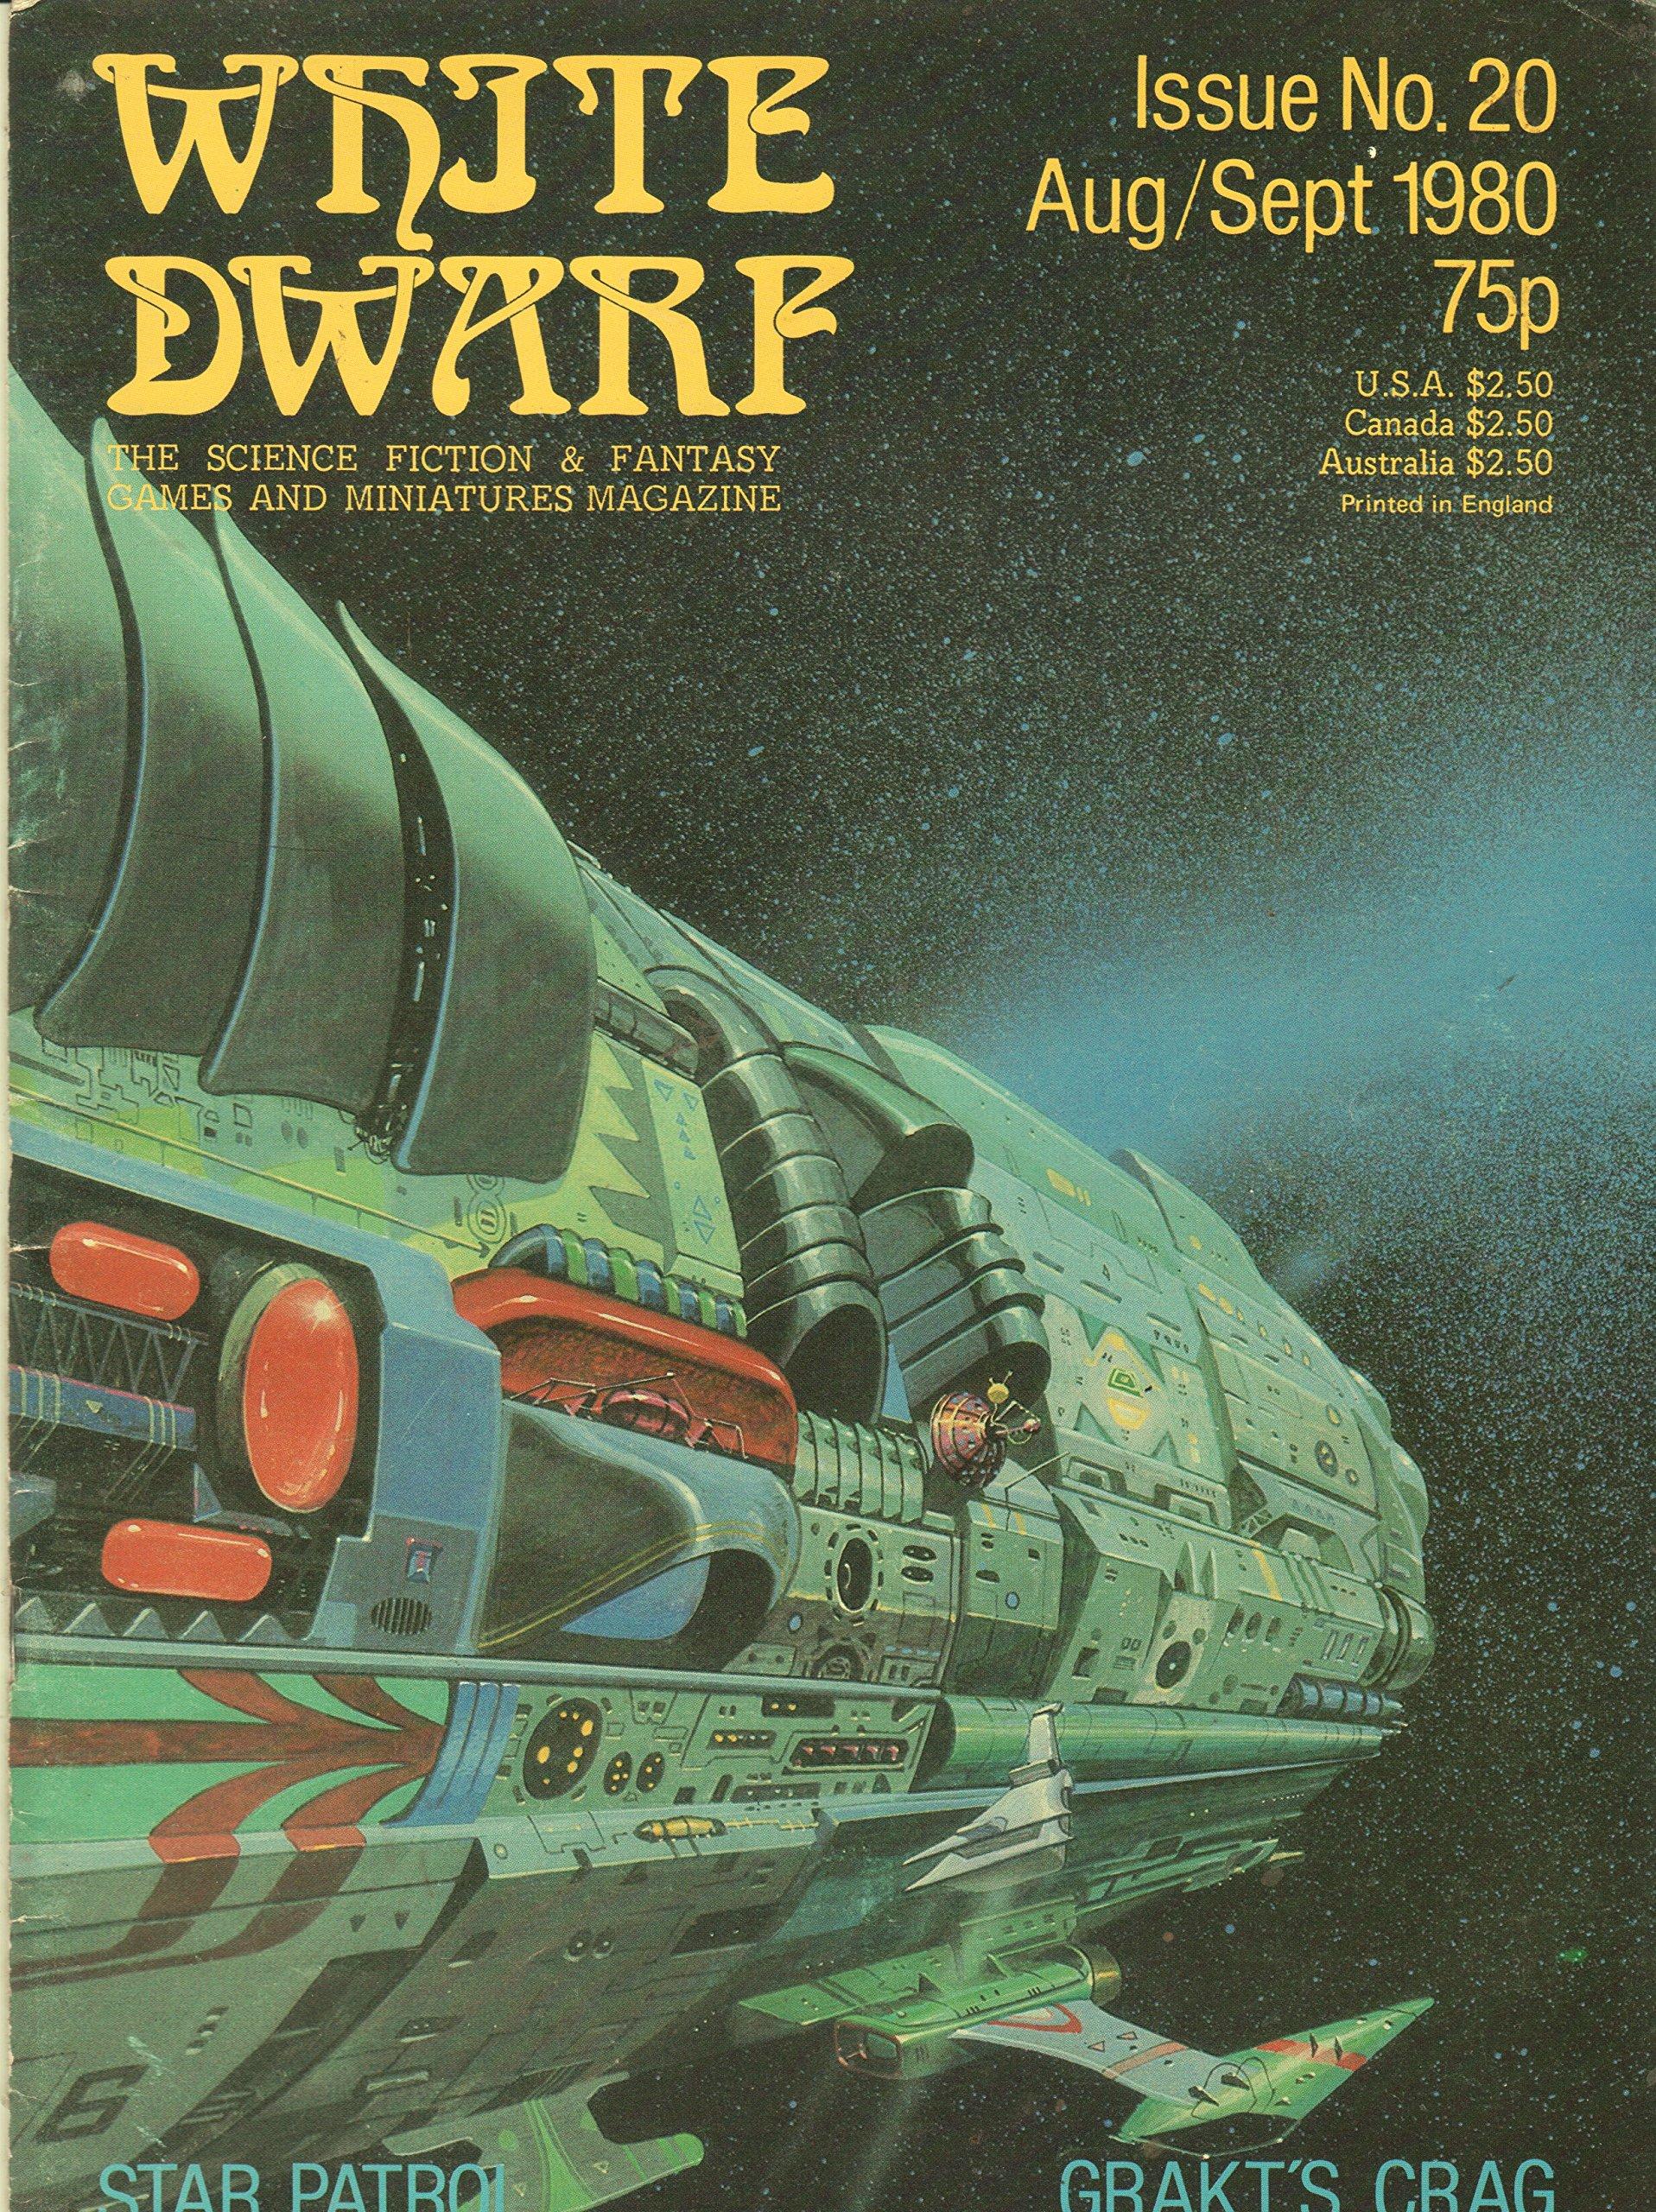 White Dwarf Magazine, Issue 20: Amazon.com: Books